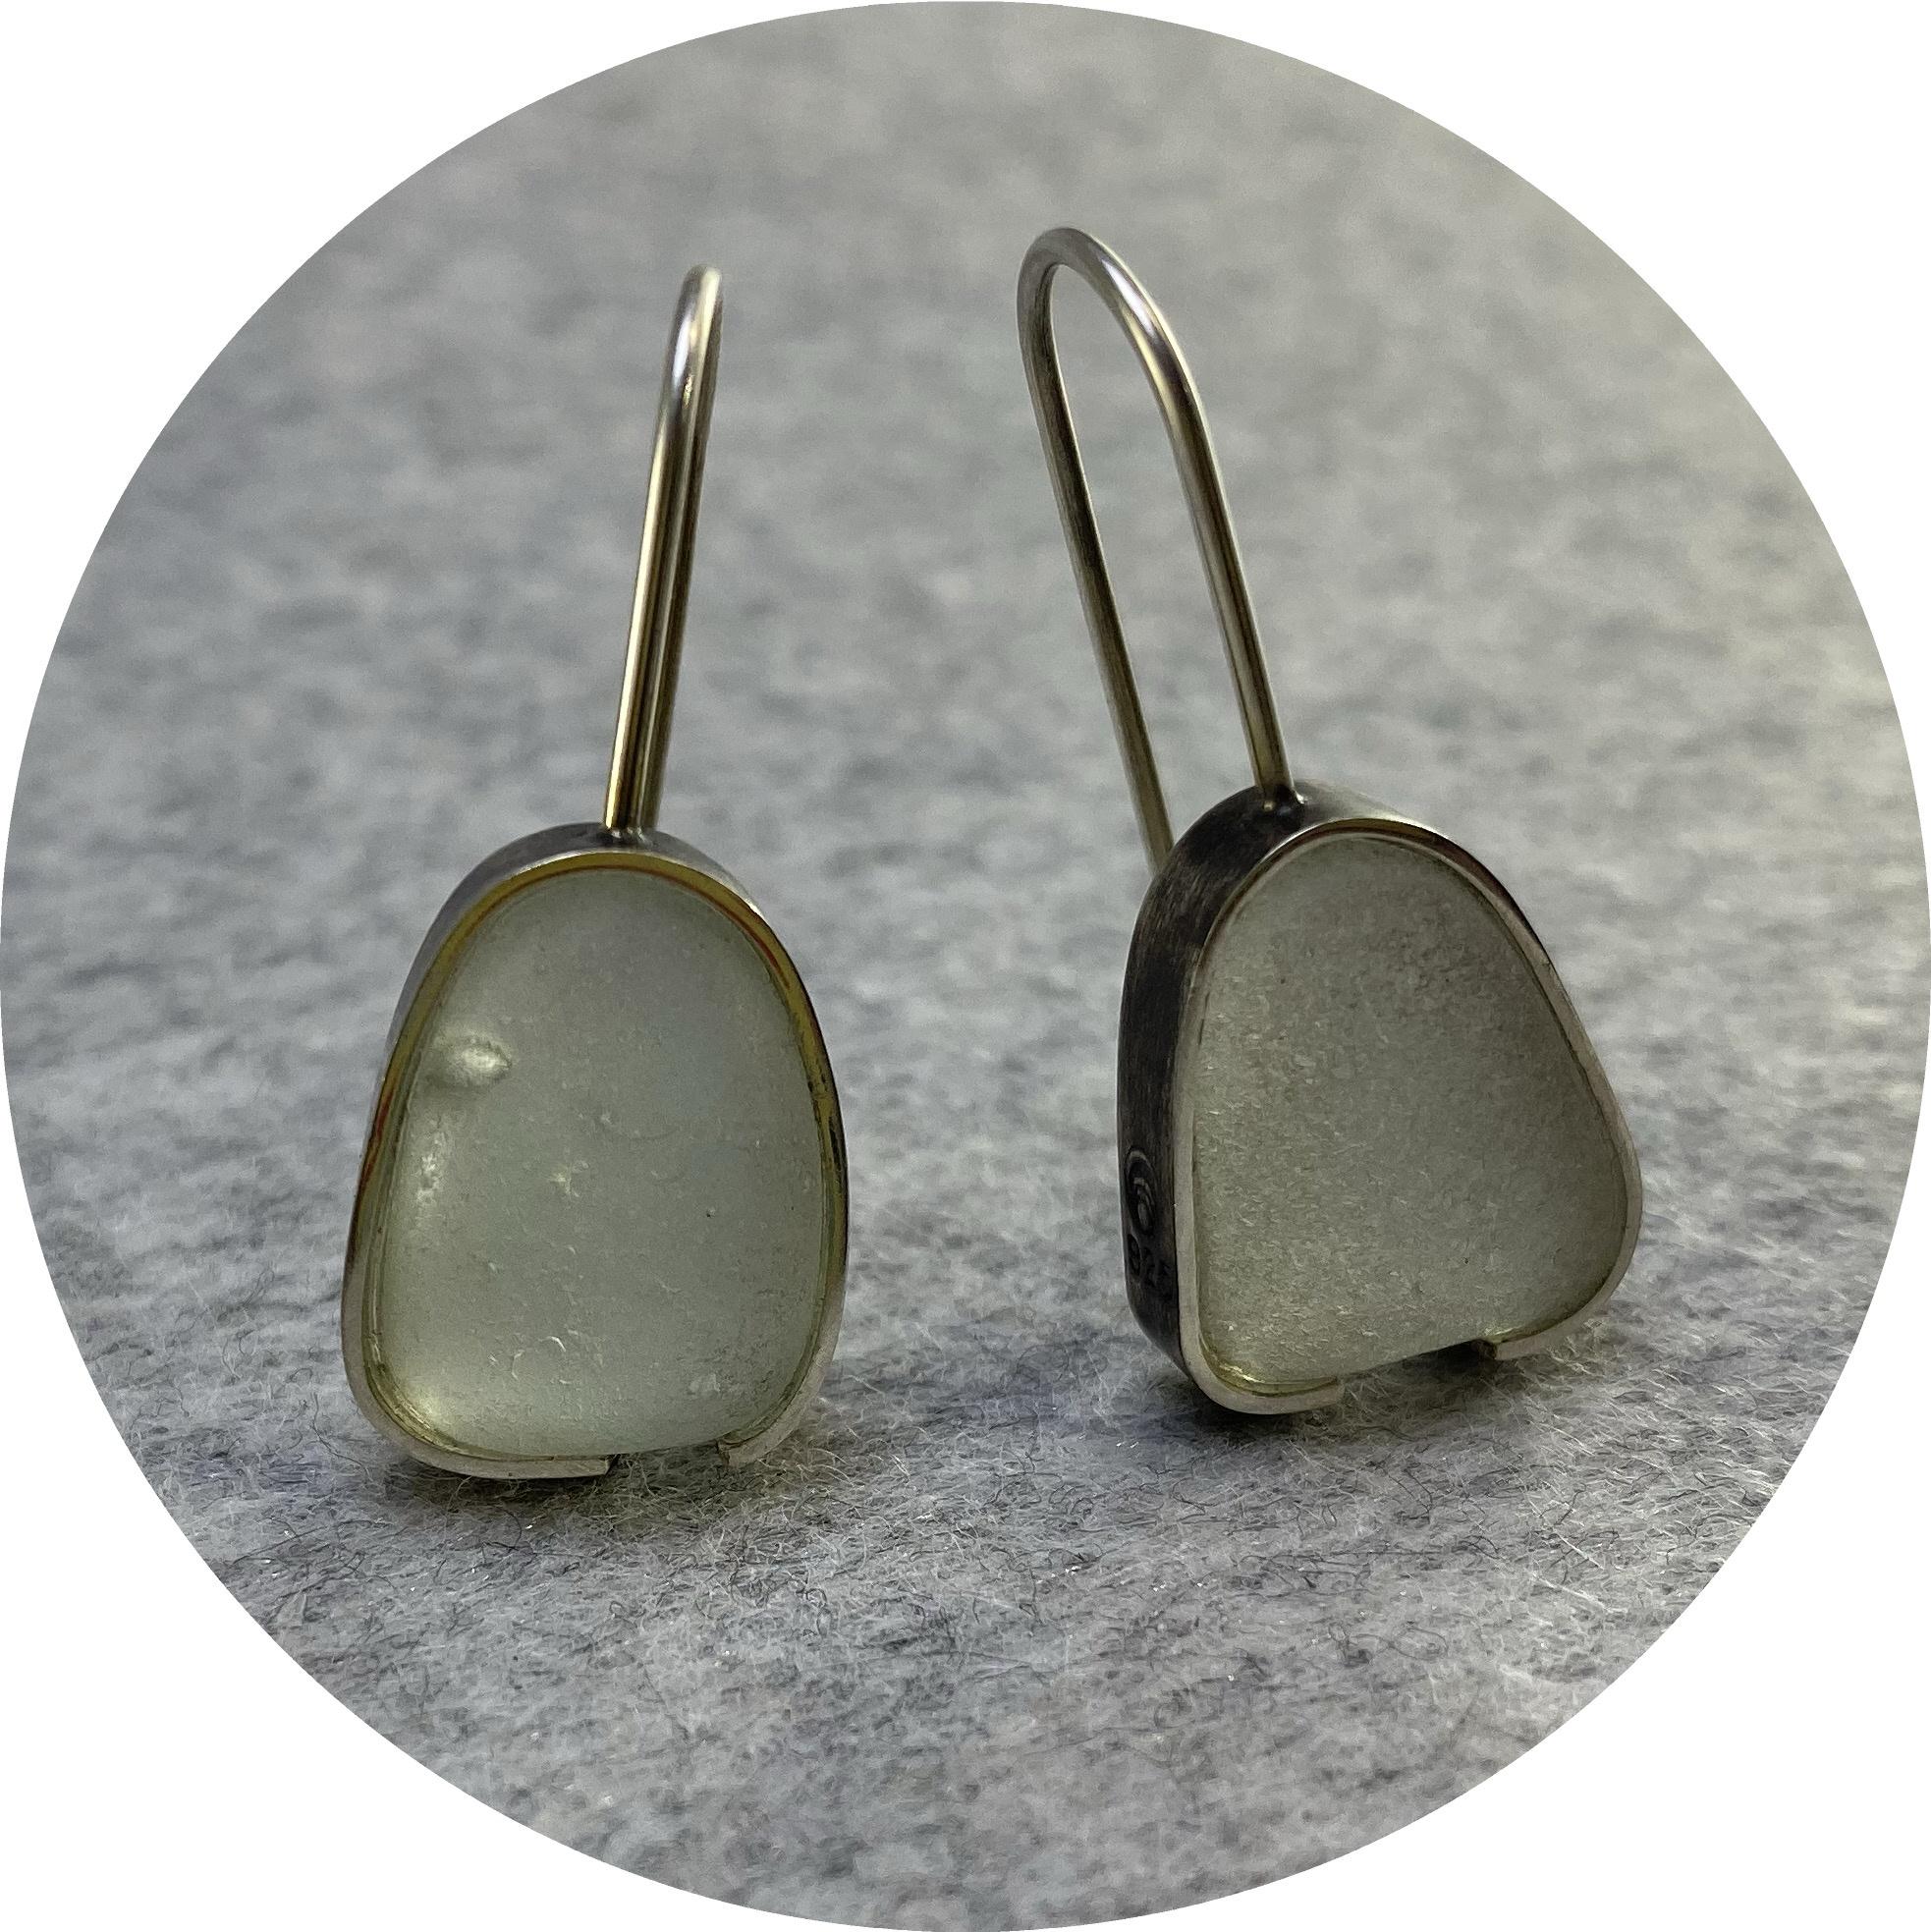 Susan Ewington - 'Pale Seafood Beach Glass Earrings', 925 silver, glass